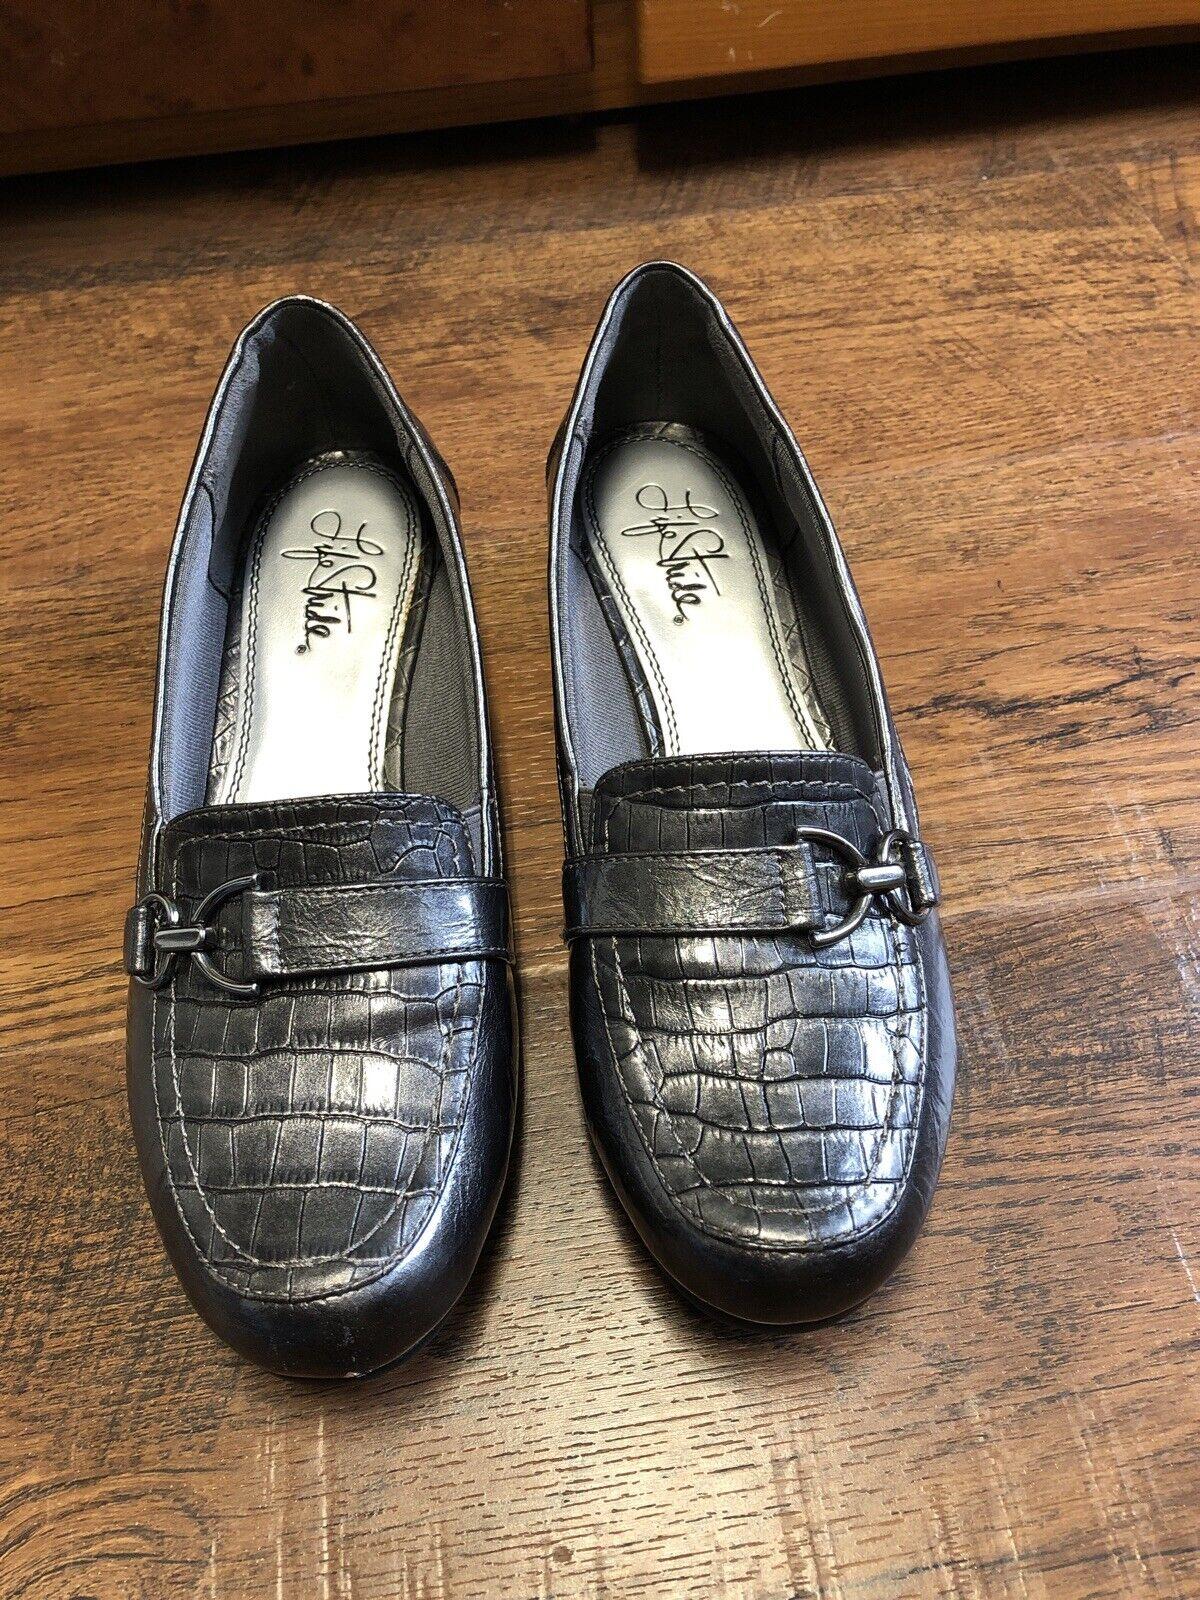 Lifestride Damon Women Loafers Grey Gray Metallic Work Flat Heels Shoes Size 8